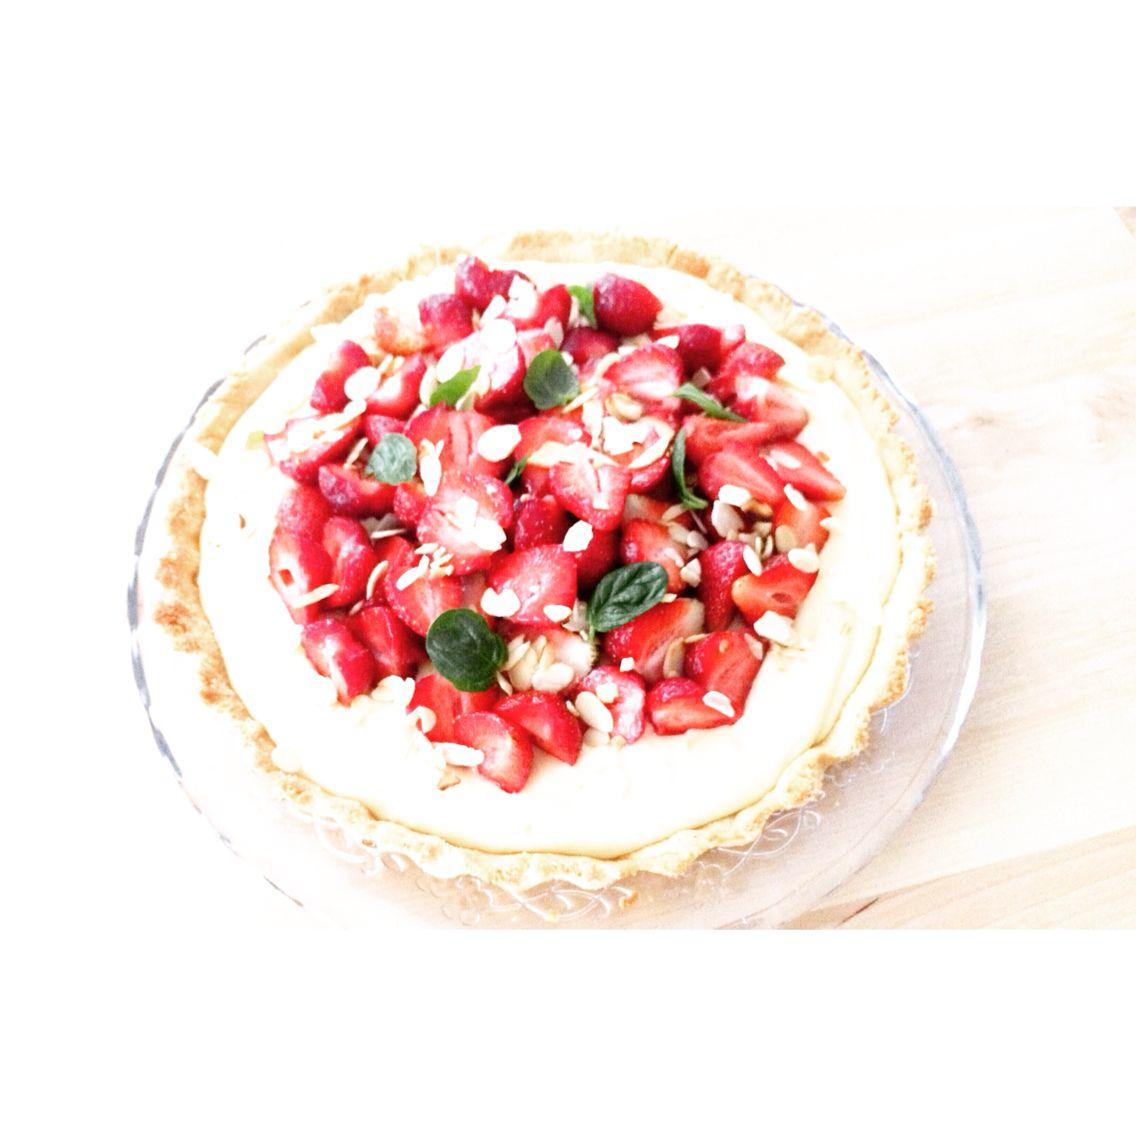 homemade strawberries and almod tart